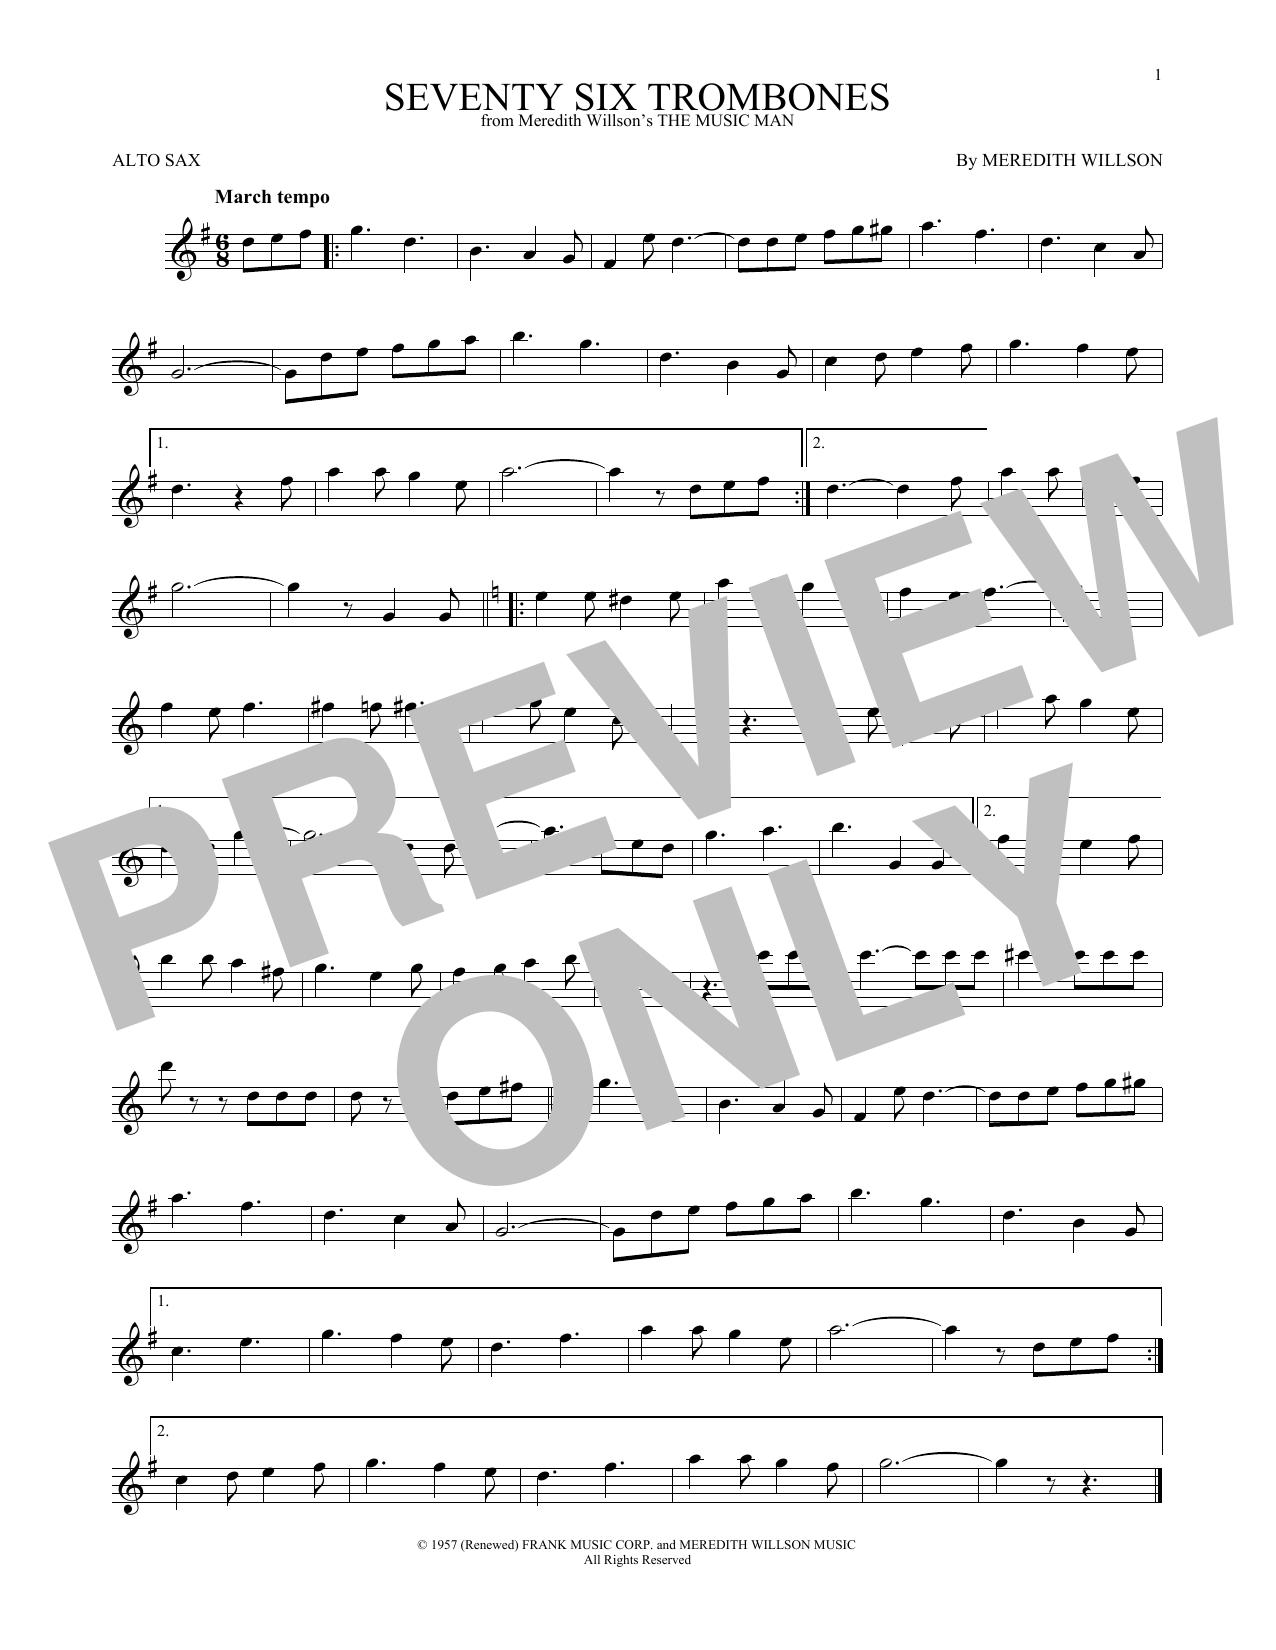 Seventy Six Trombones Sheet Music